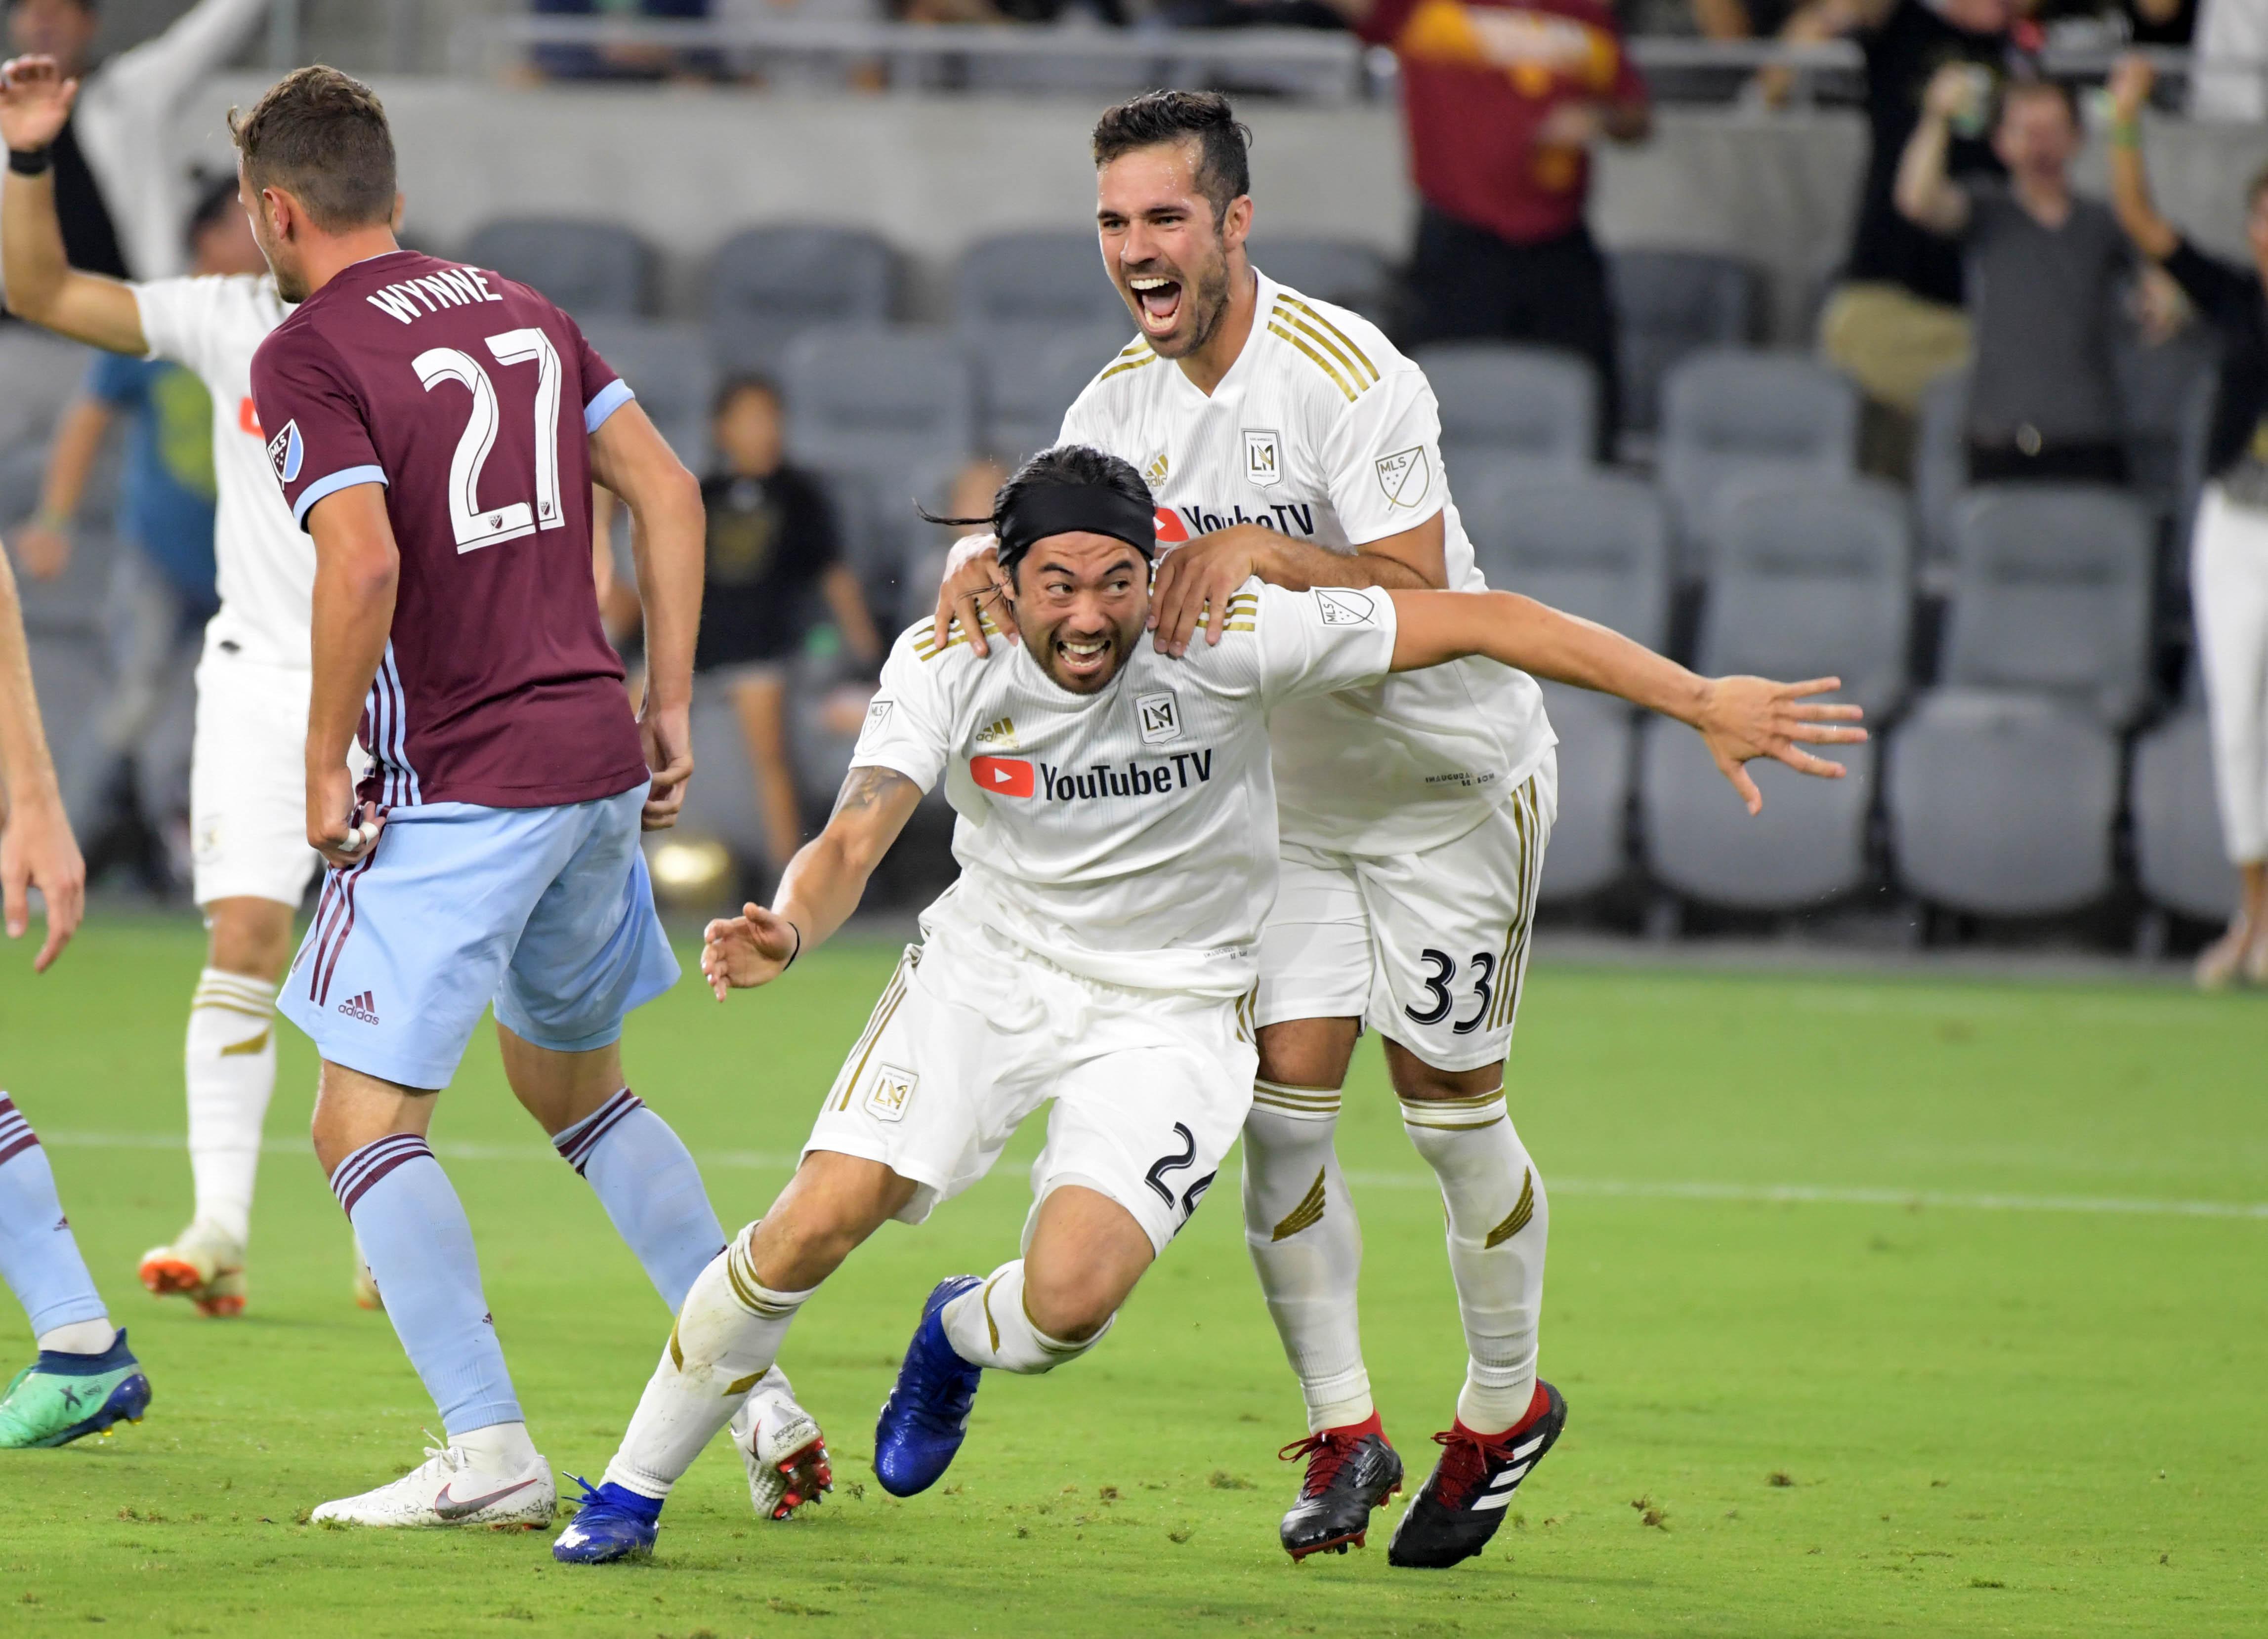 MLS - Los Angeles FC - Lee Nguyen celebrates with Benny Feilhaber